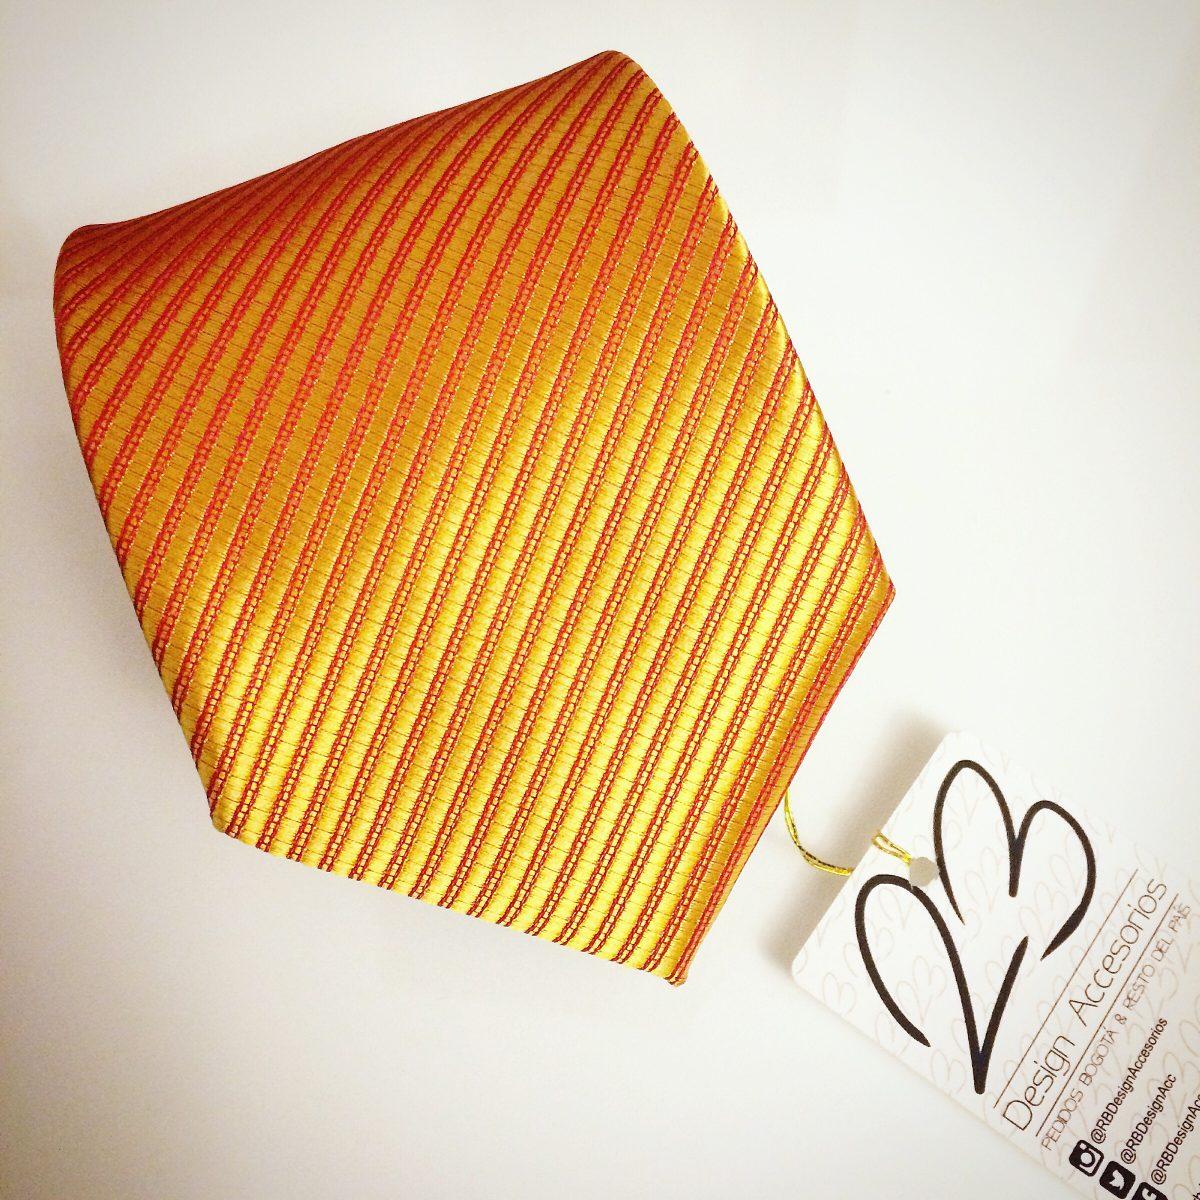 Corbata de 8cm color naranja amarillo quemado en sat n - Amarillo naranja ...